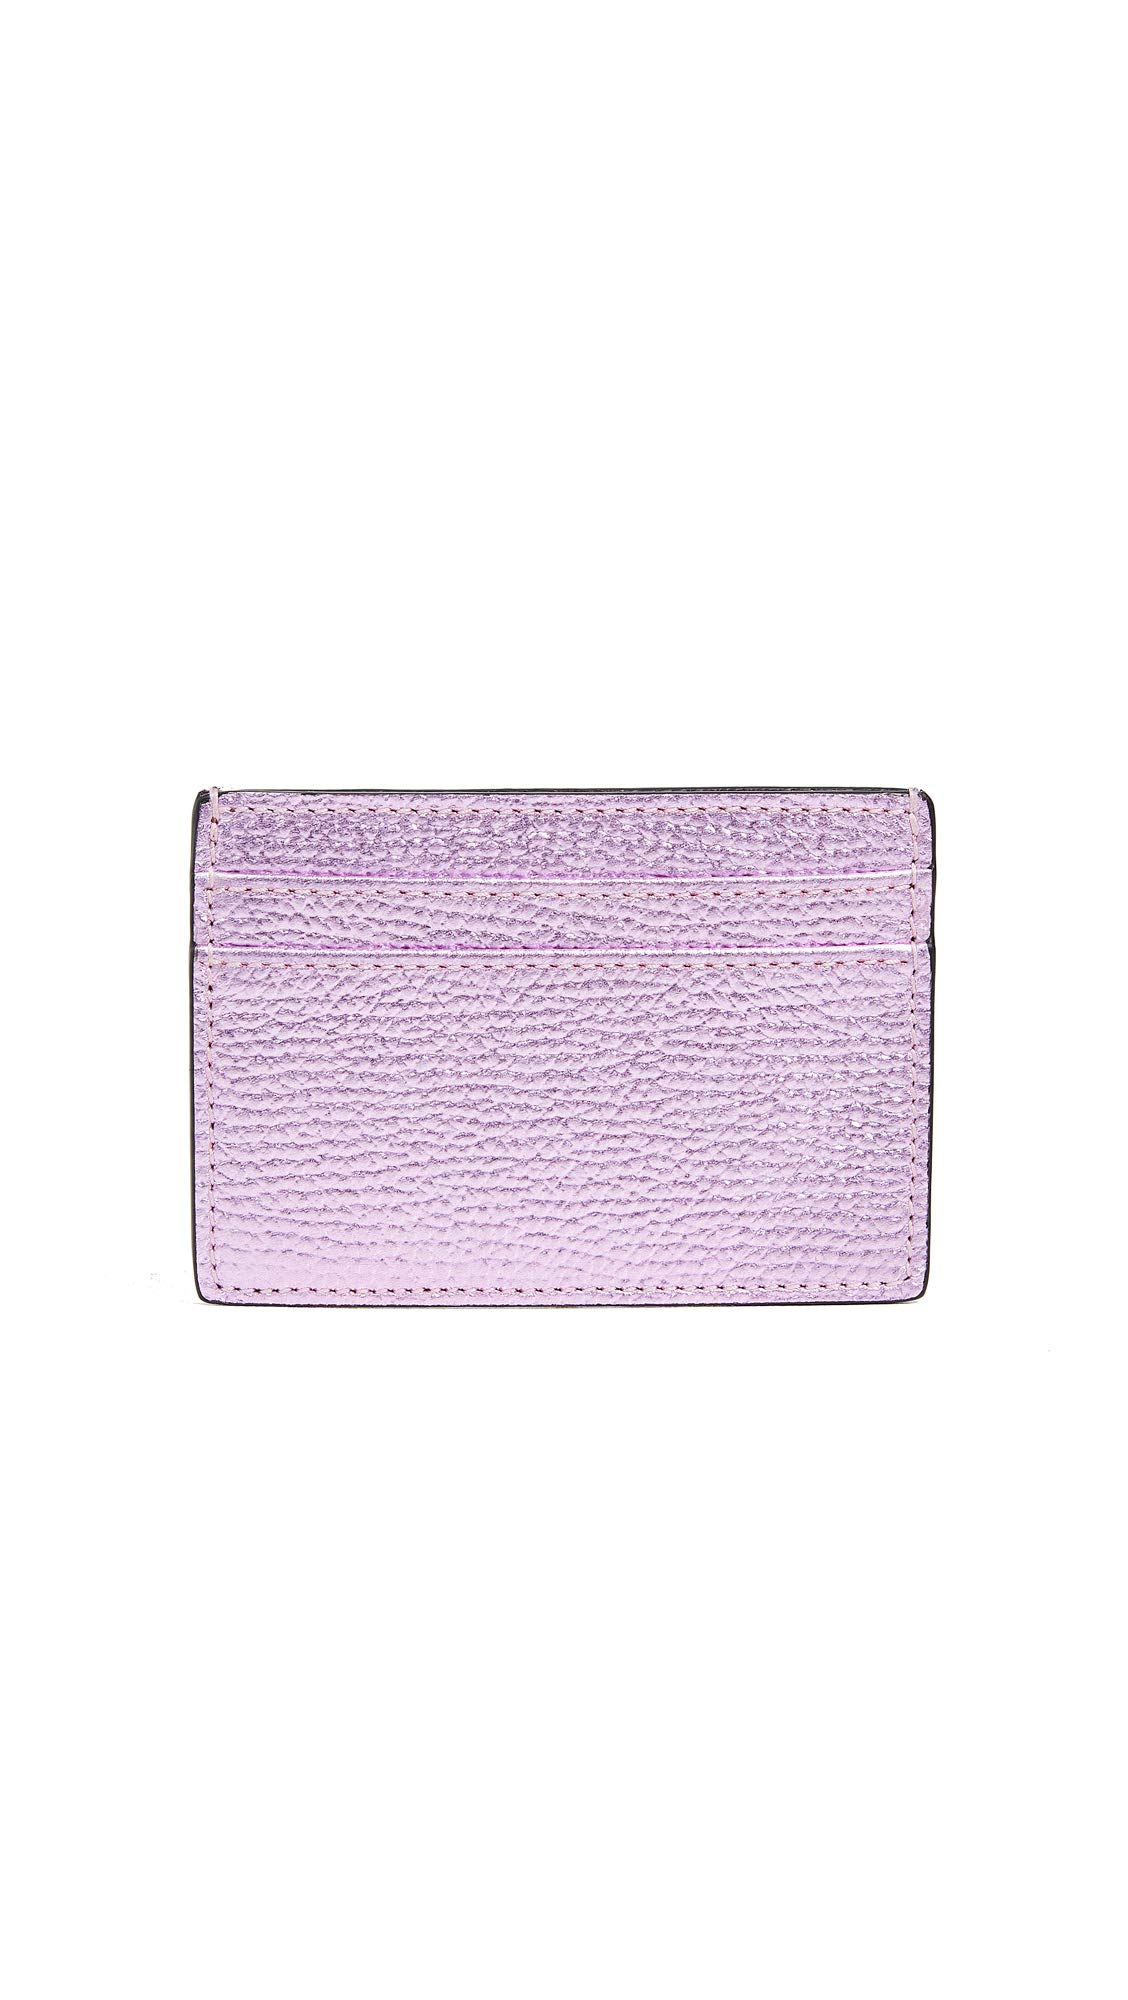 Smythson Women's Metallic Leather Flat Card Holder, Old Rose/Blush, One Size